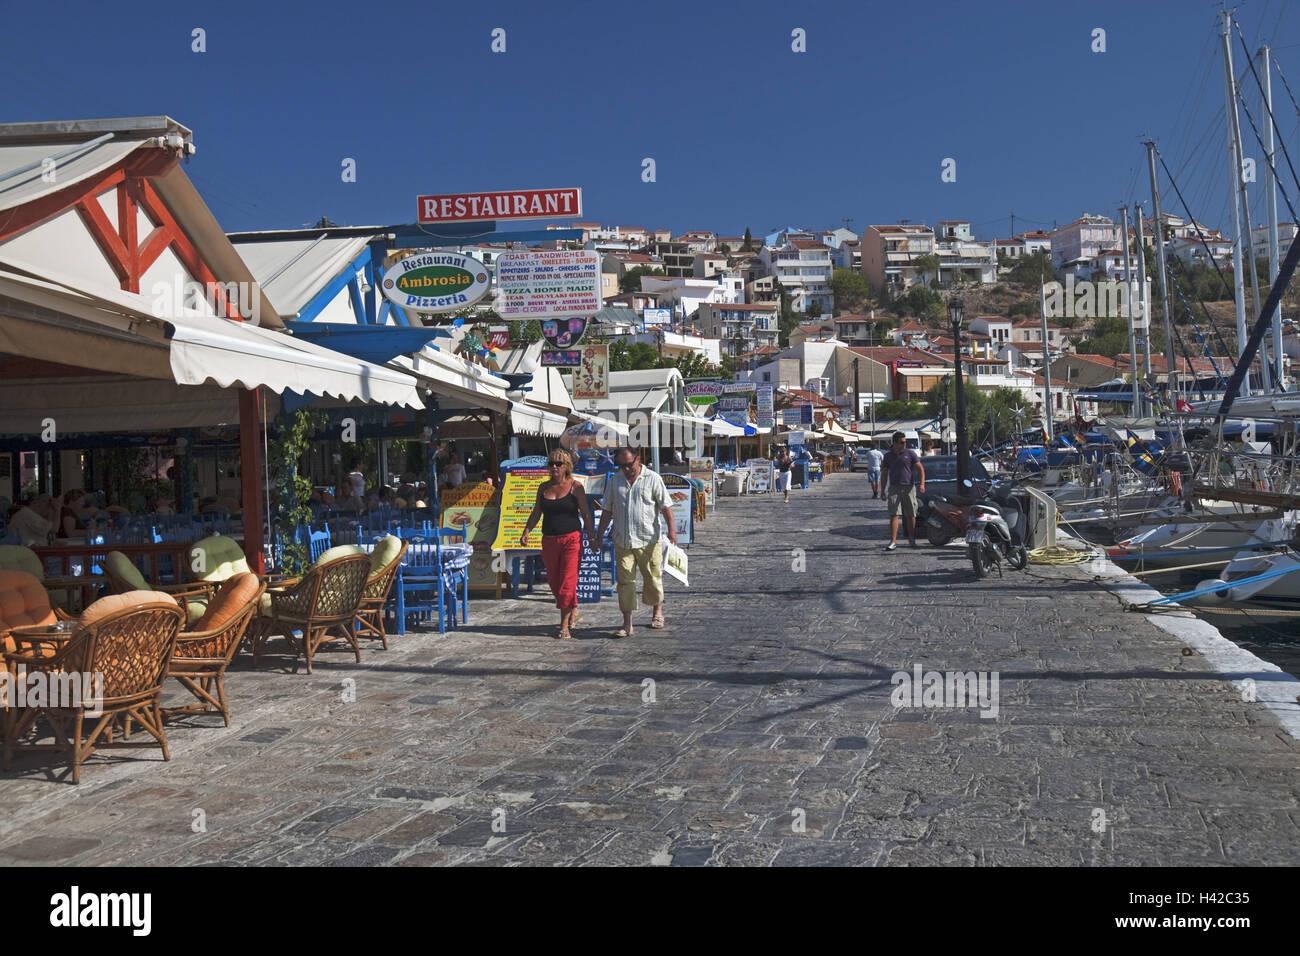 Harbour promenade, Pythagorion, island Samos, Mediterranean island, Greece, Europe, Stock Photo